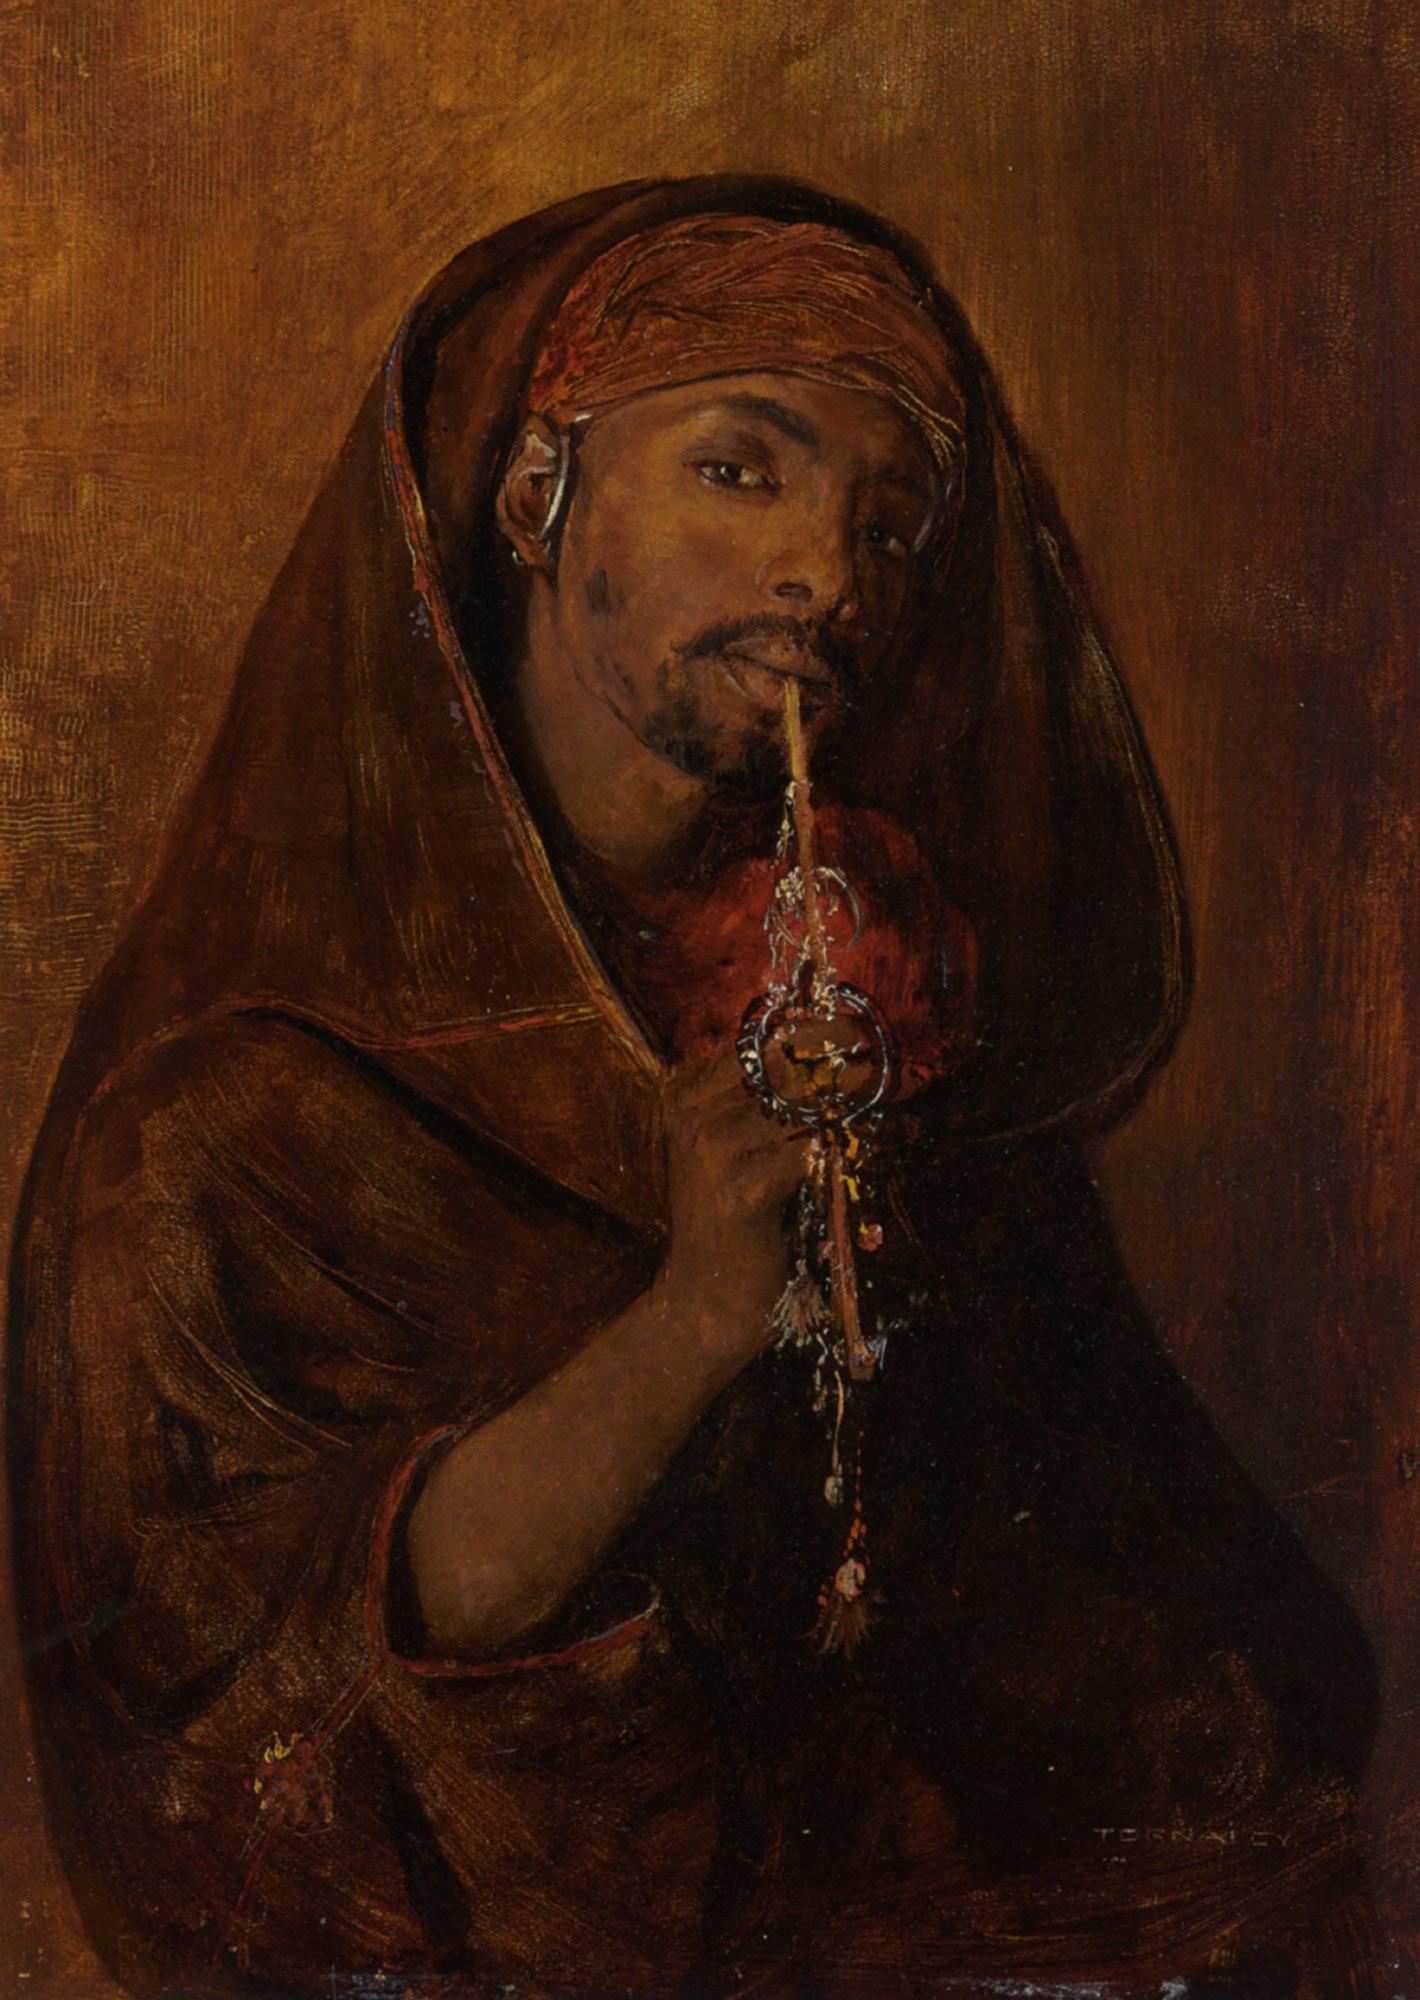 File:Tornai The Moorish Smoker.jpg - Wikimedia Commons